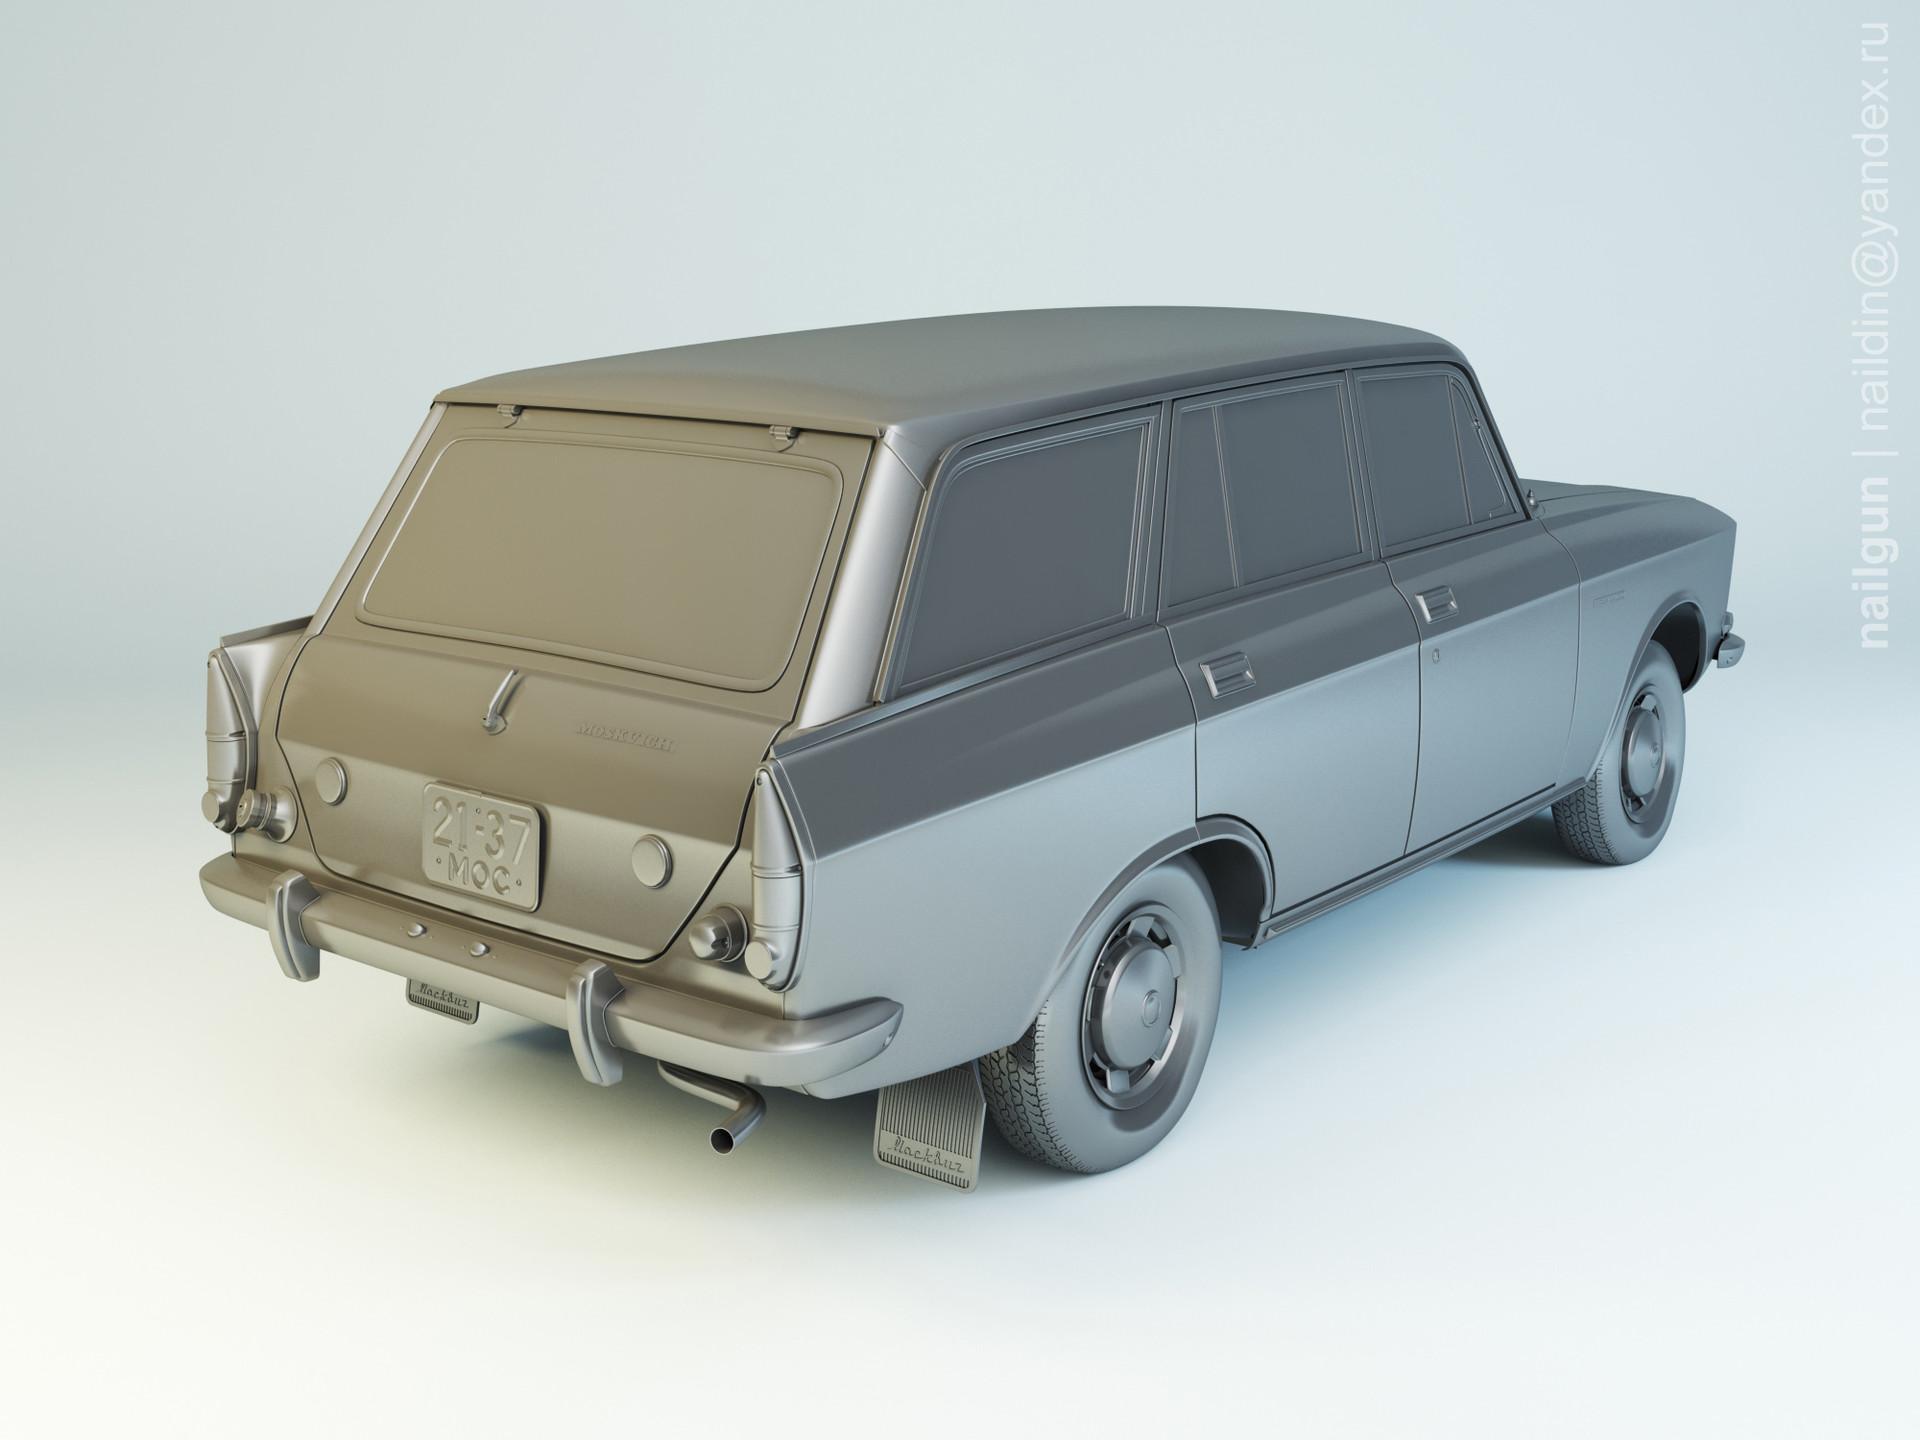 Nail khusnutdinov al 133 005 azlk 2137 moskvich modelling 1